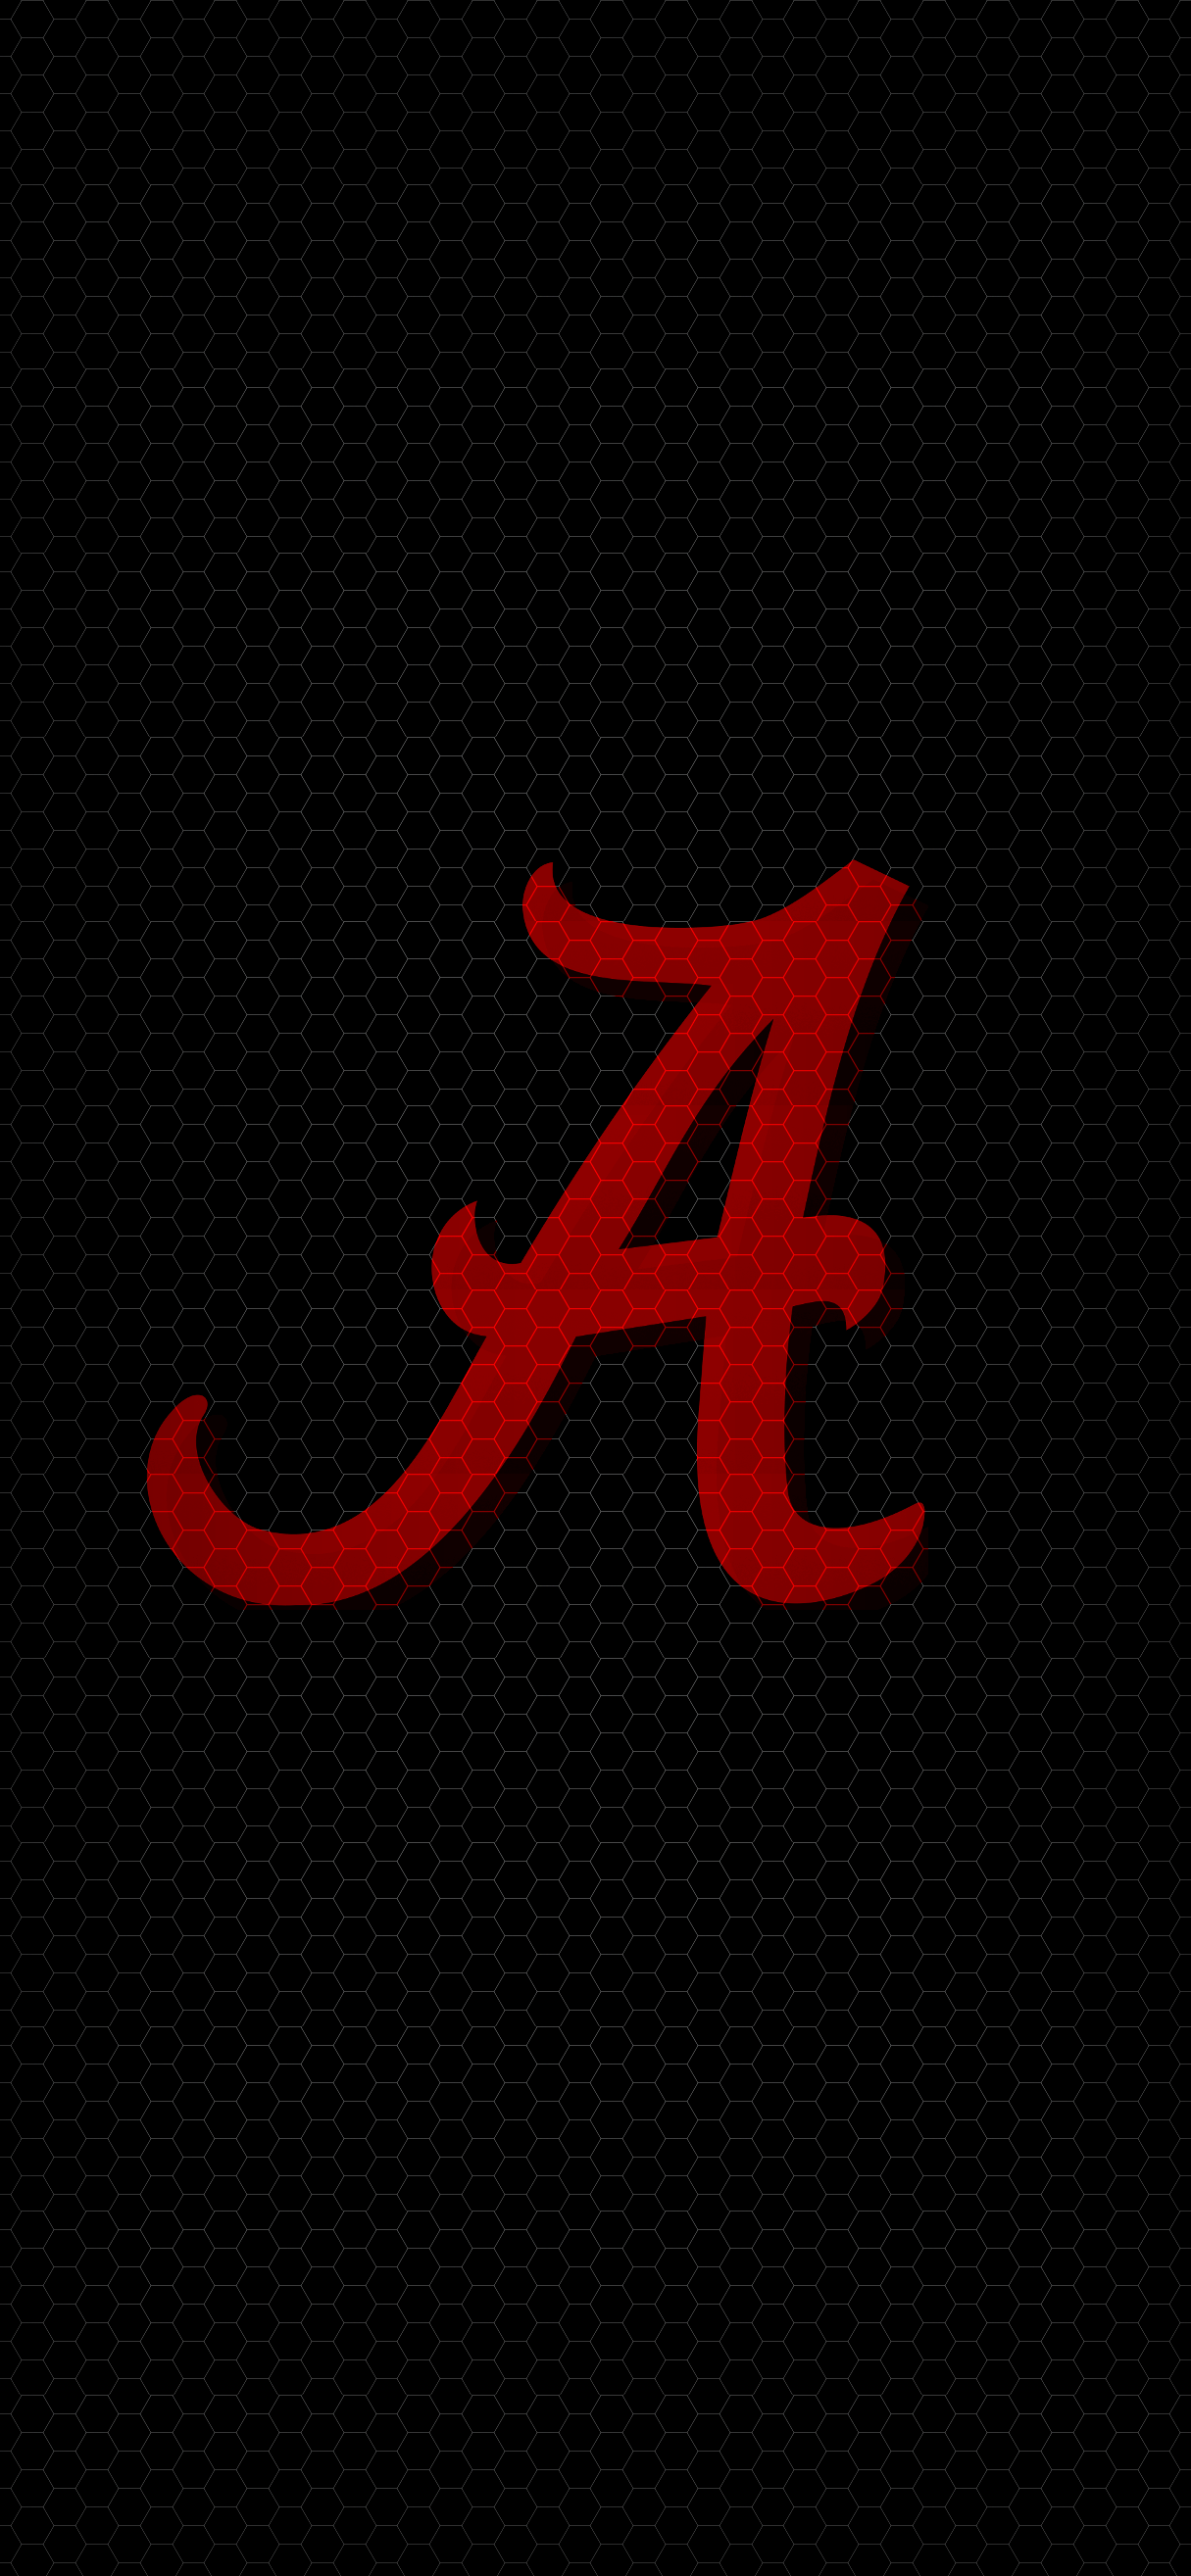 Alabama Football Wallpaper Alabama Crimson Tide Logo Alabama Wallpaper Alabama Football